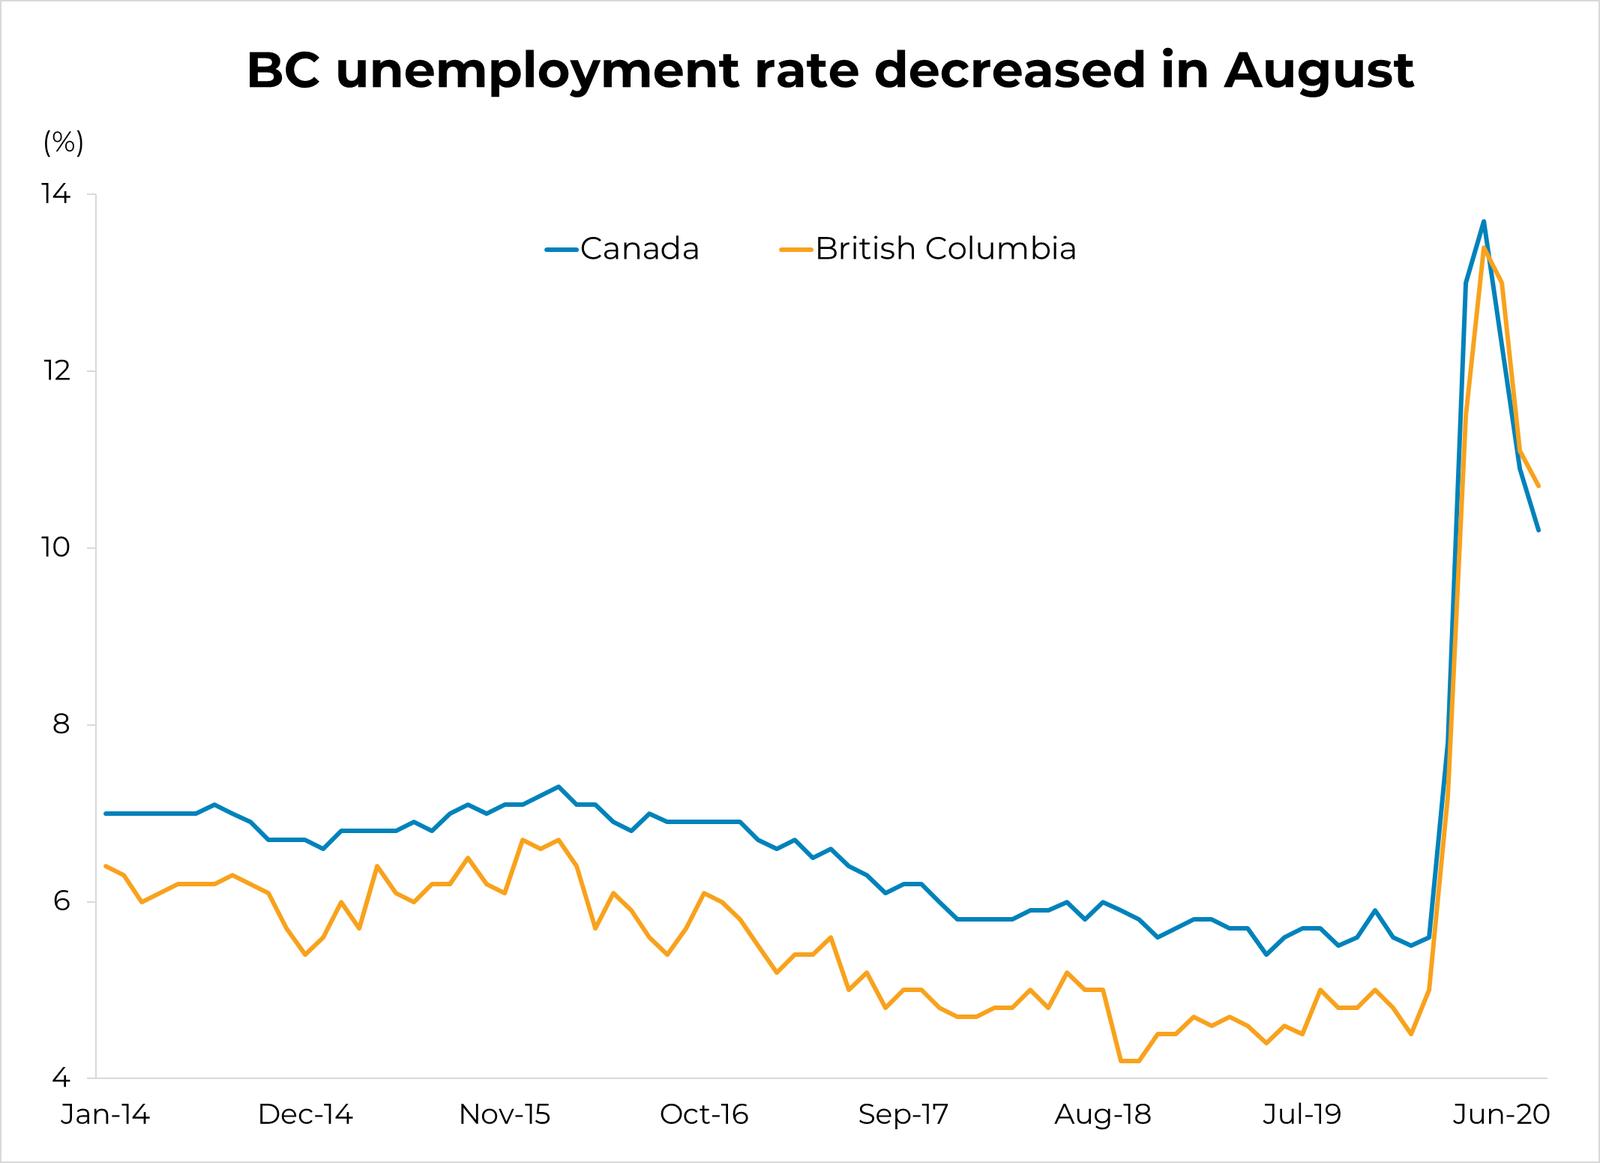 BC Unemployment Rate - August 2020